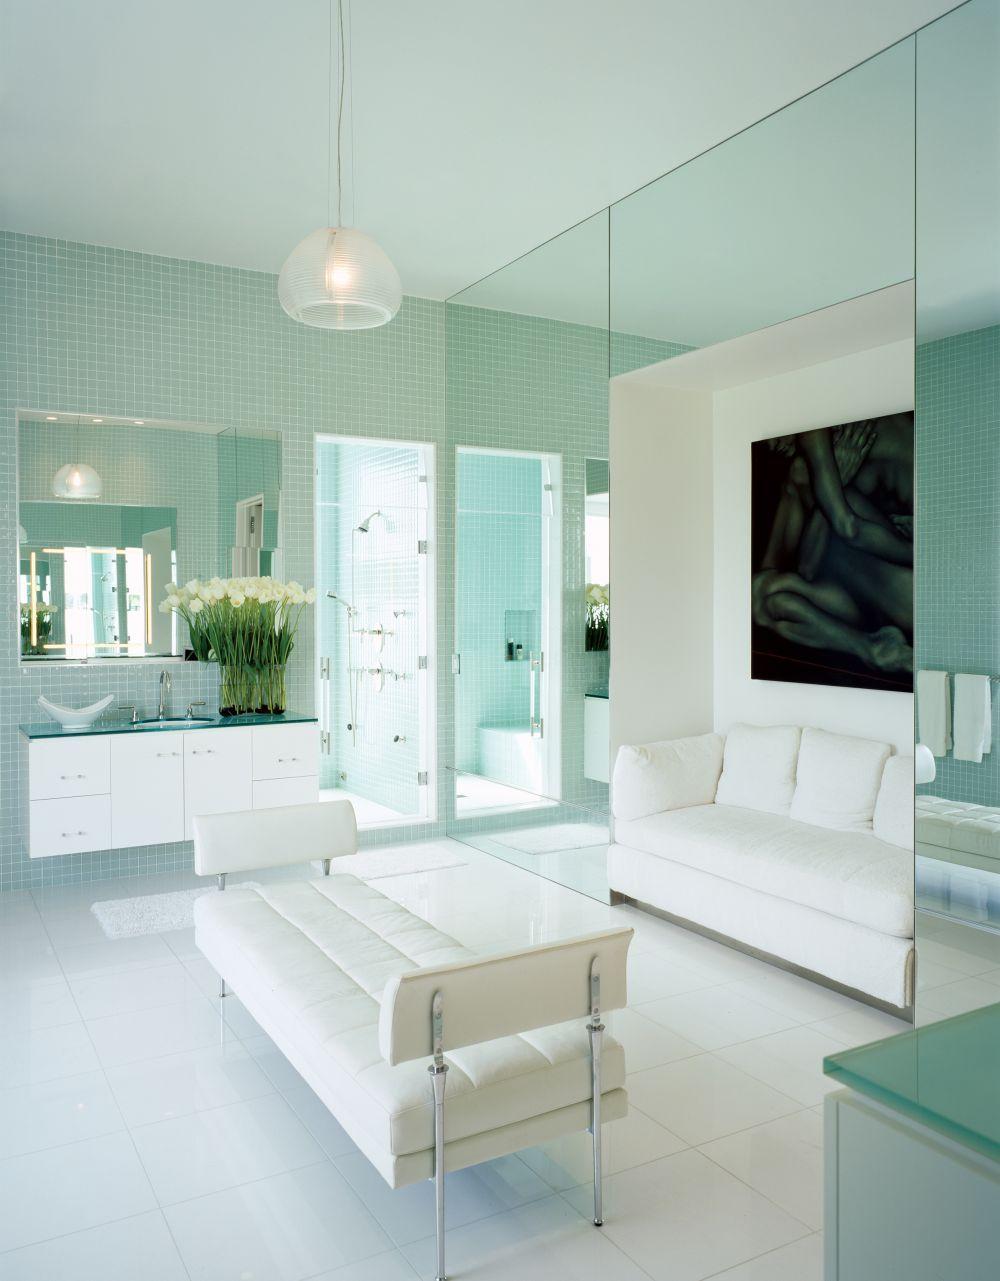 Modern bathroom by jennifer post design inc and jennifer post design inc in los angeles california